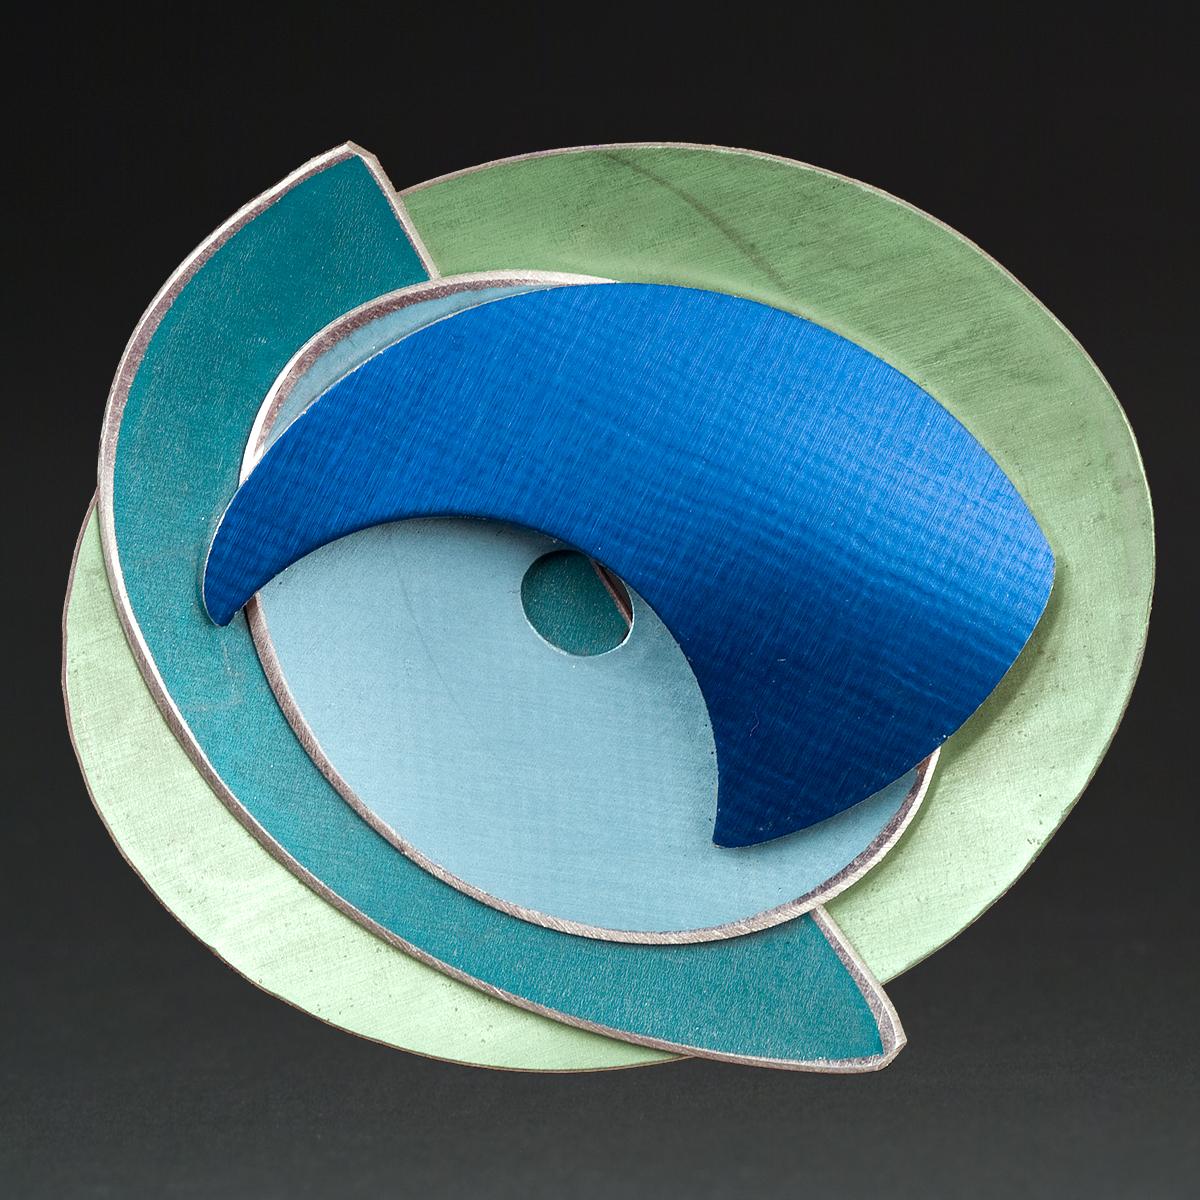 C - Lime, Turquoise, Aqua, Royal